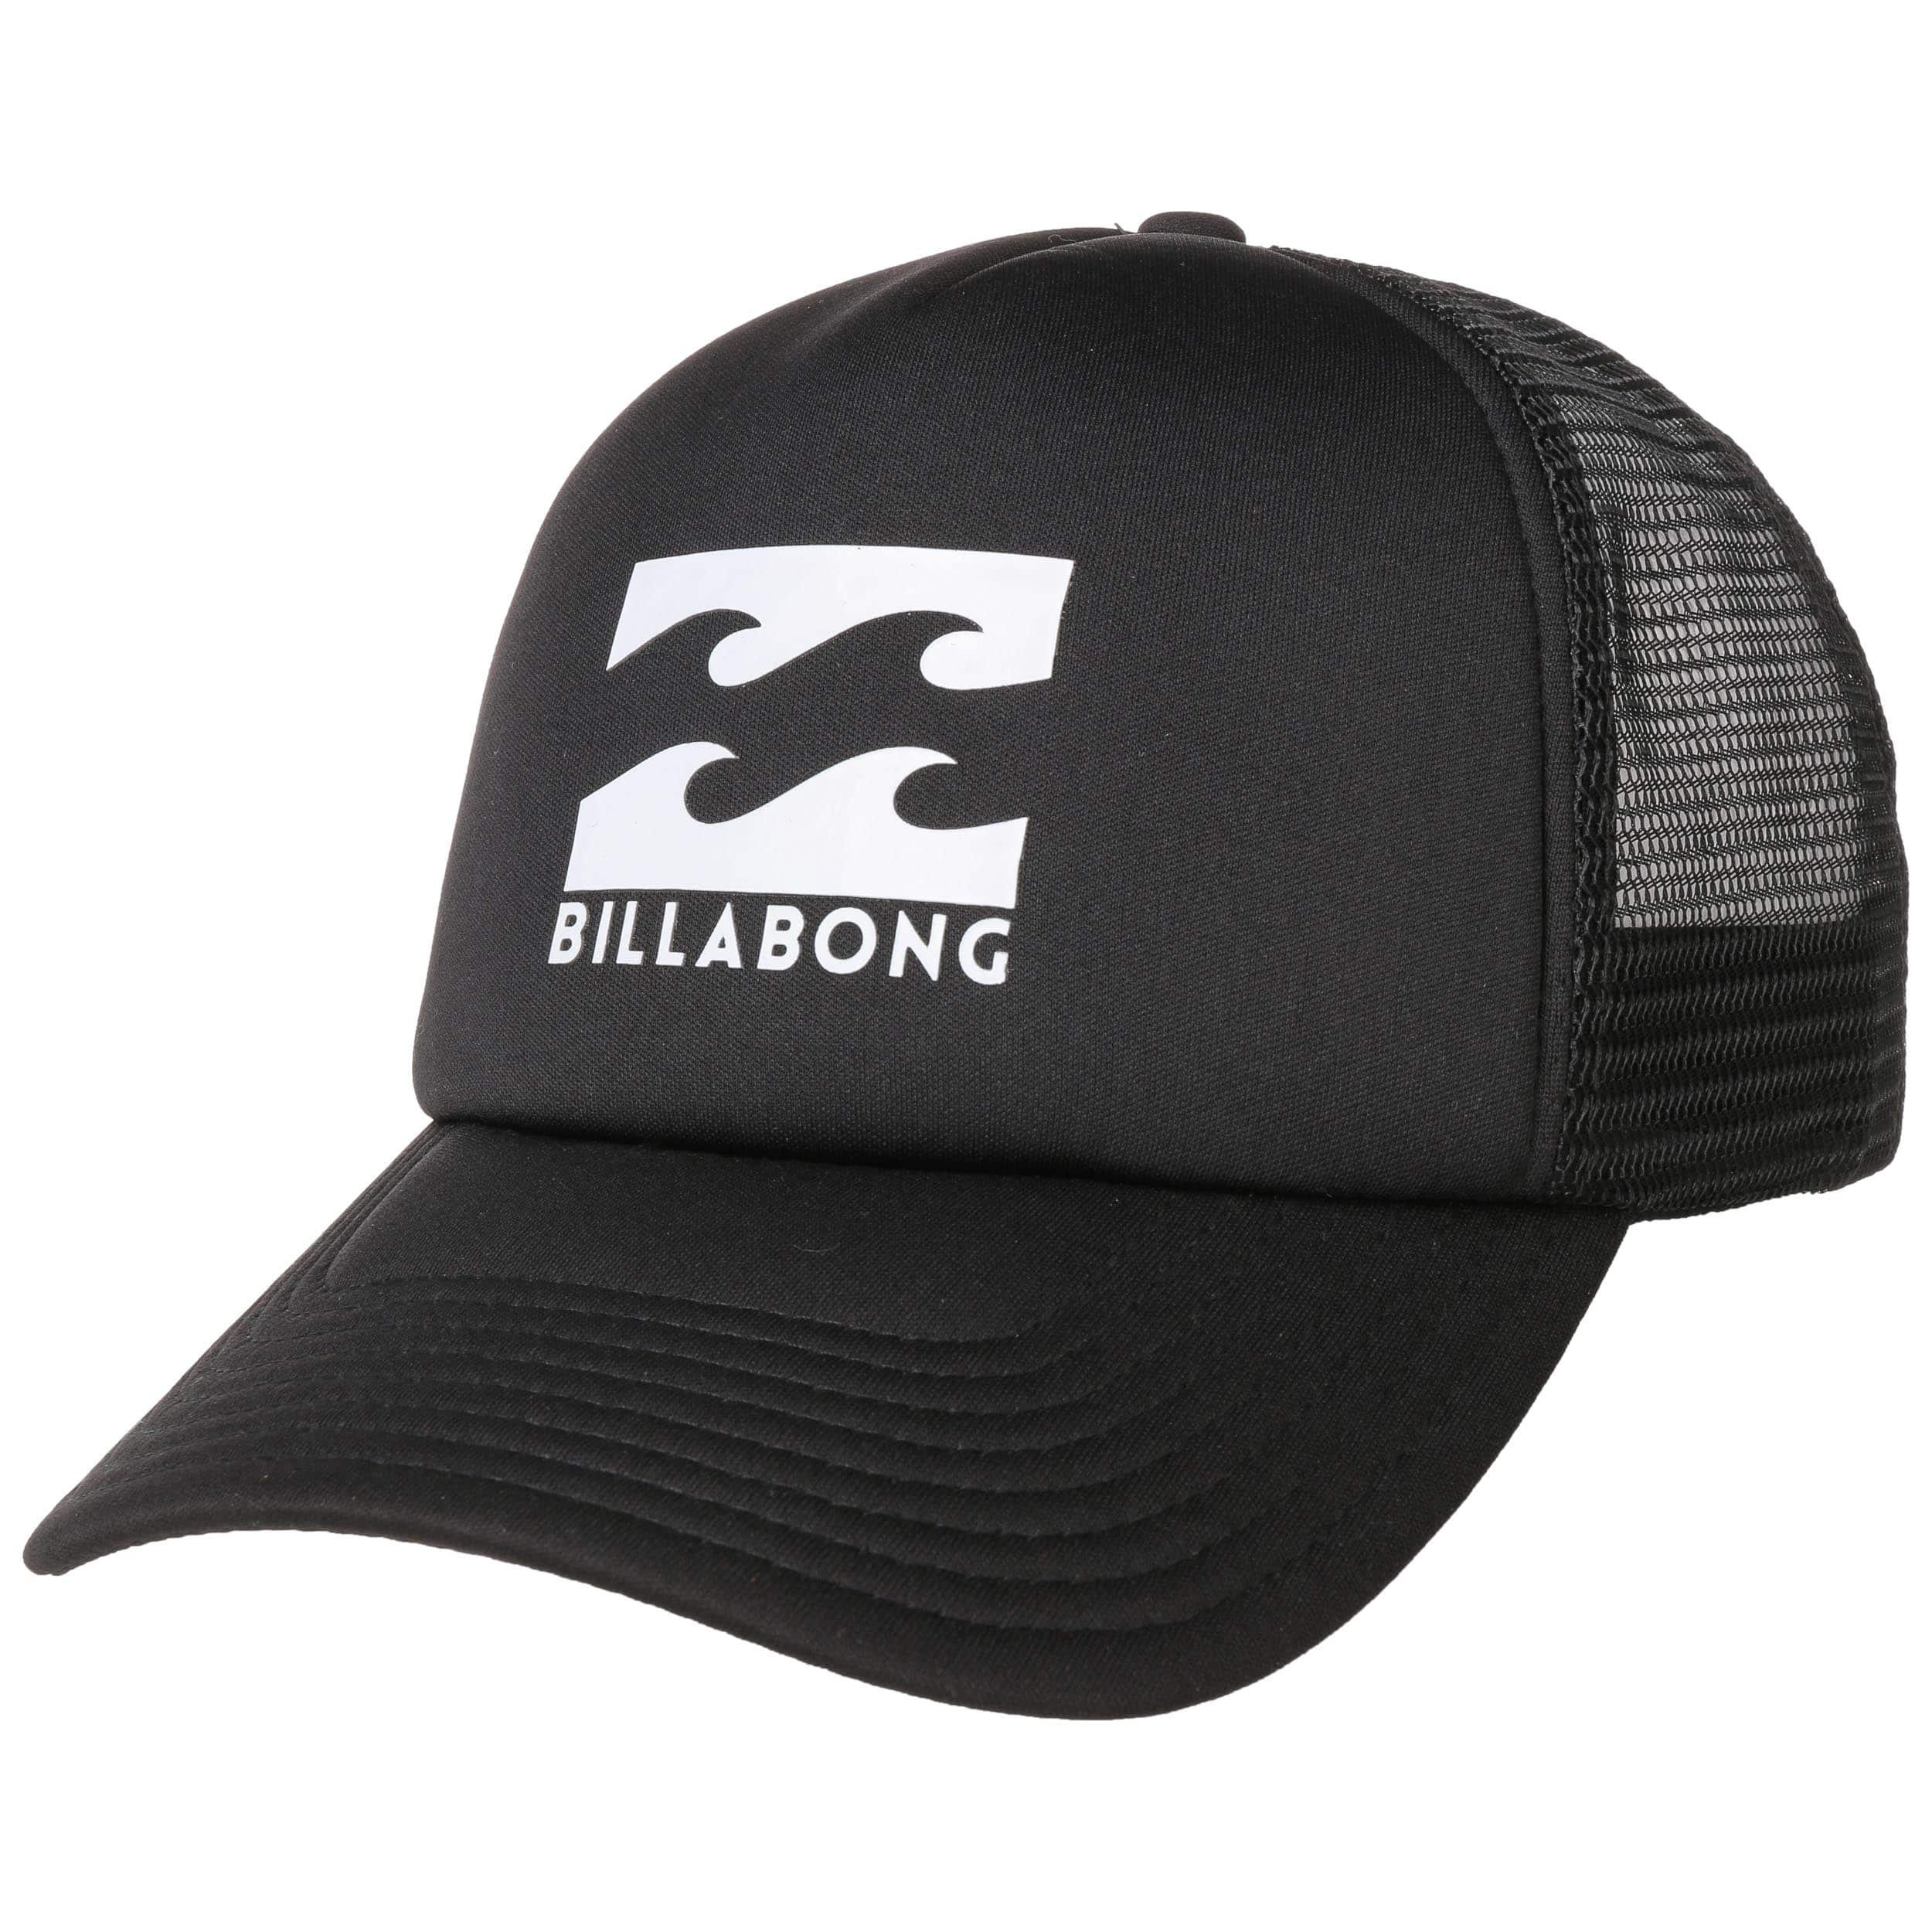 215625d473b45 Gorra Podium Trucker by Billabong - Gorras - sombreroshop.es